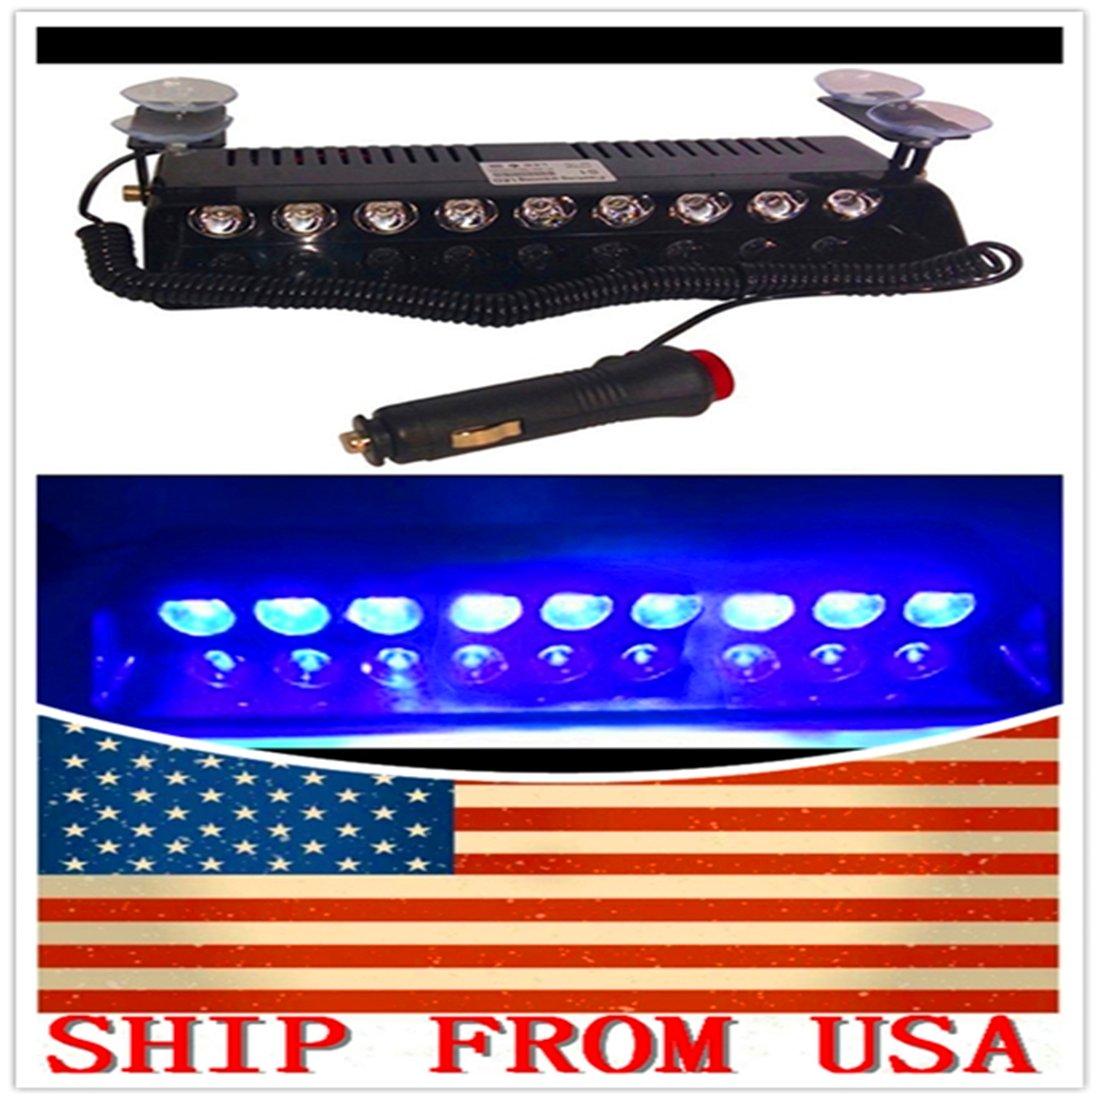 1Pc GQE Led Warning Lamp 9Bulbs Car Emergency Police Firemen Dash Flashing Beacon Bright Auto Strobe Light 12V Blue